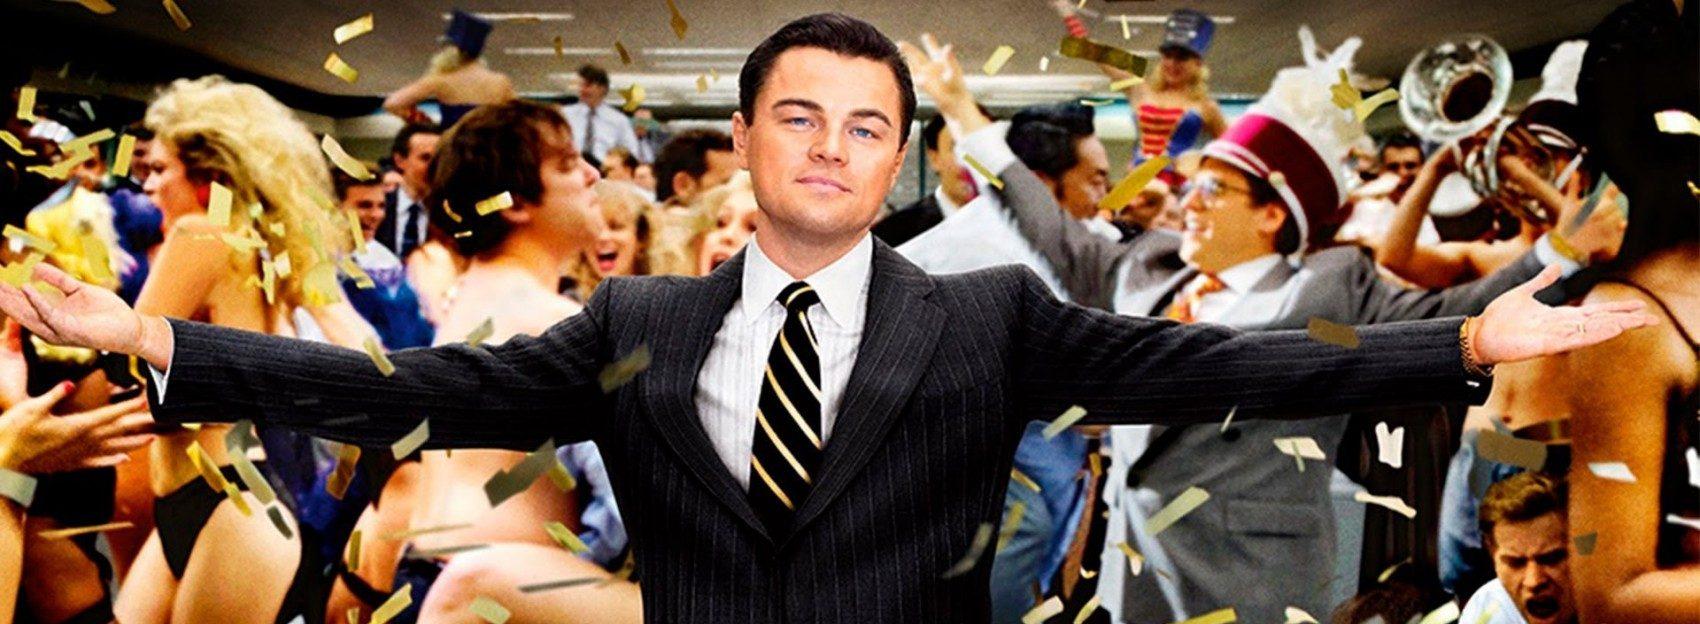 The Wolf of Wall Street oroscopo cinematografico